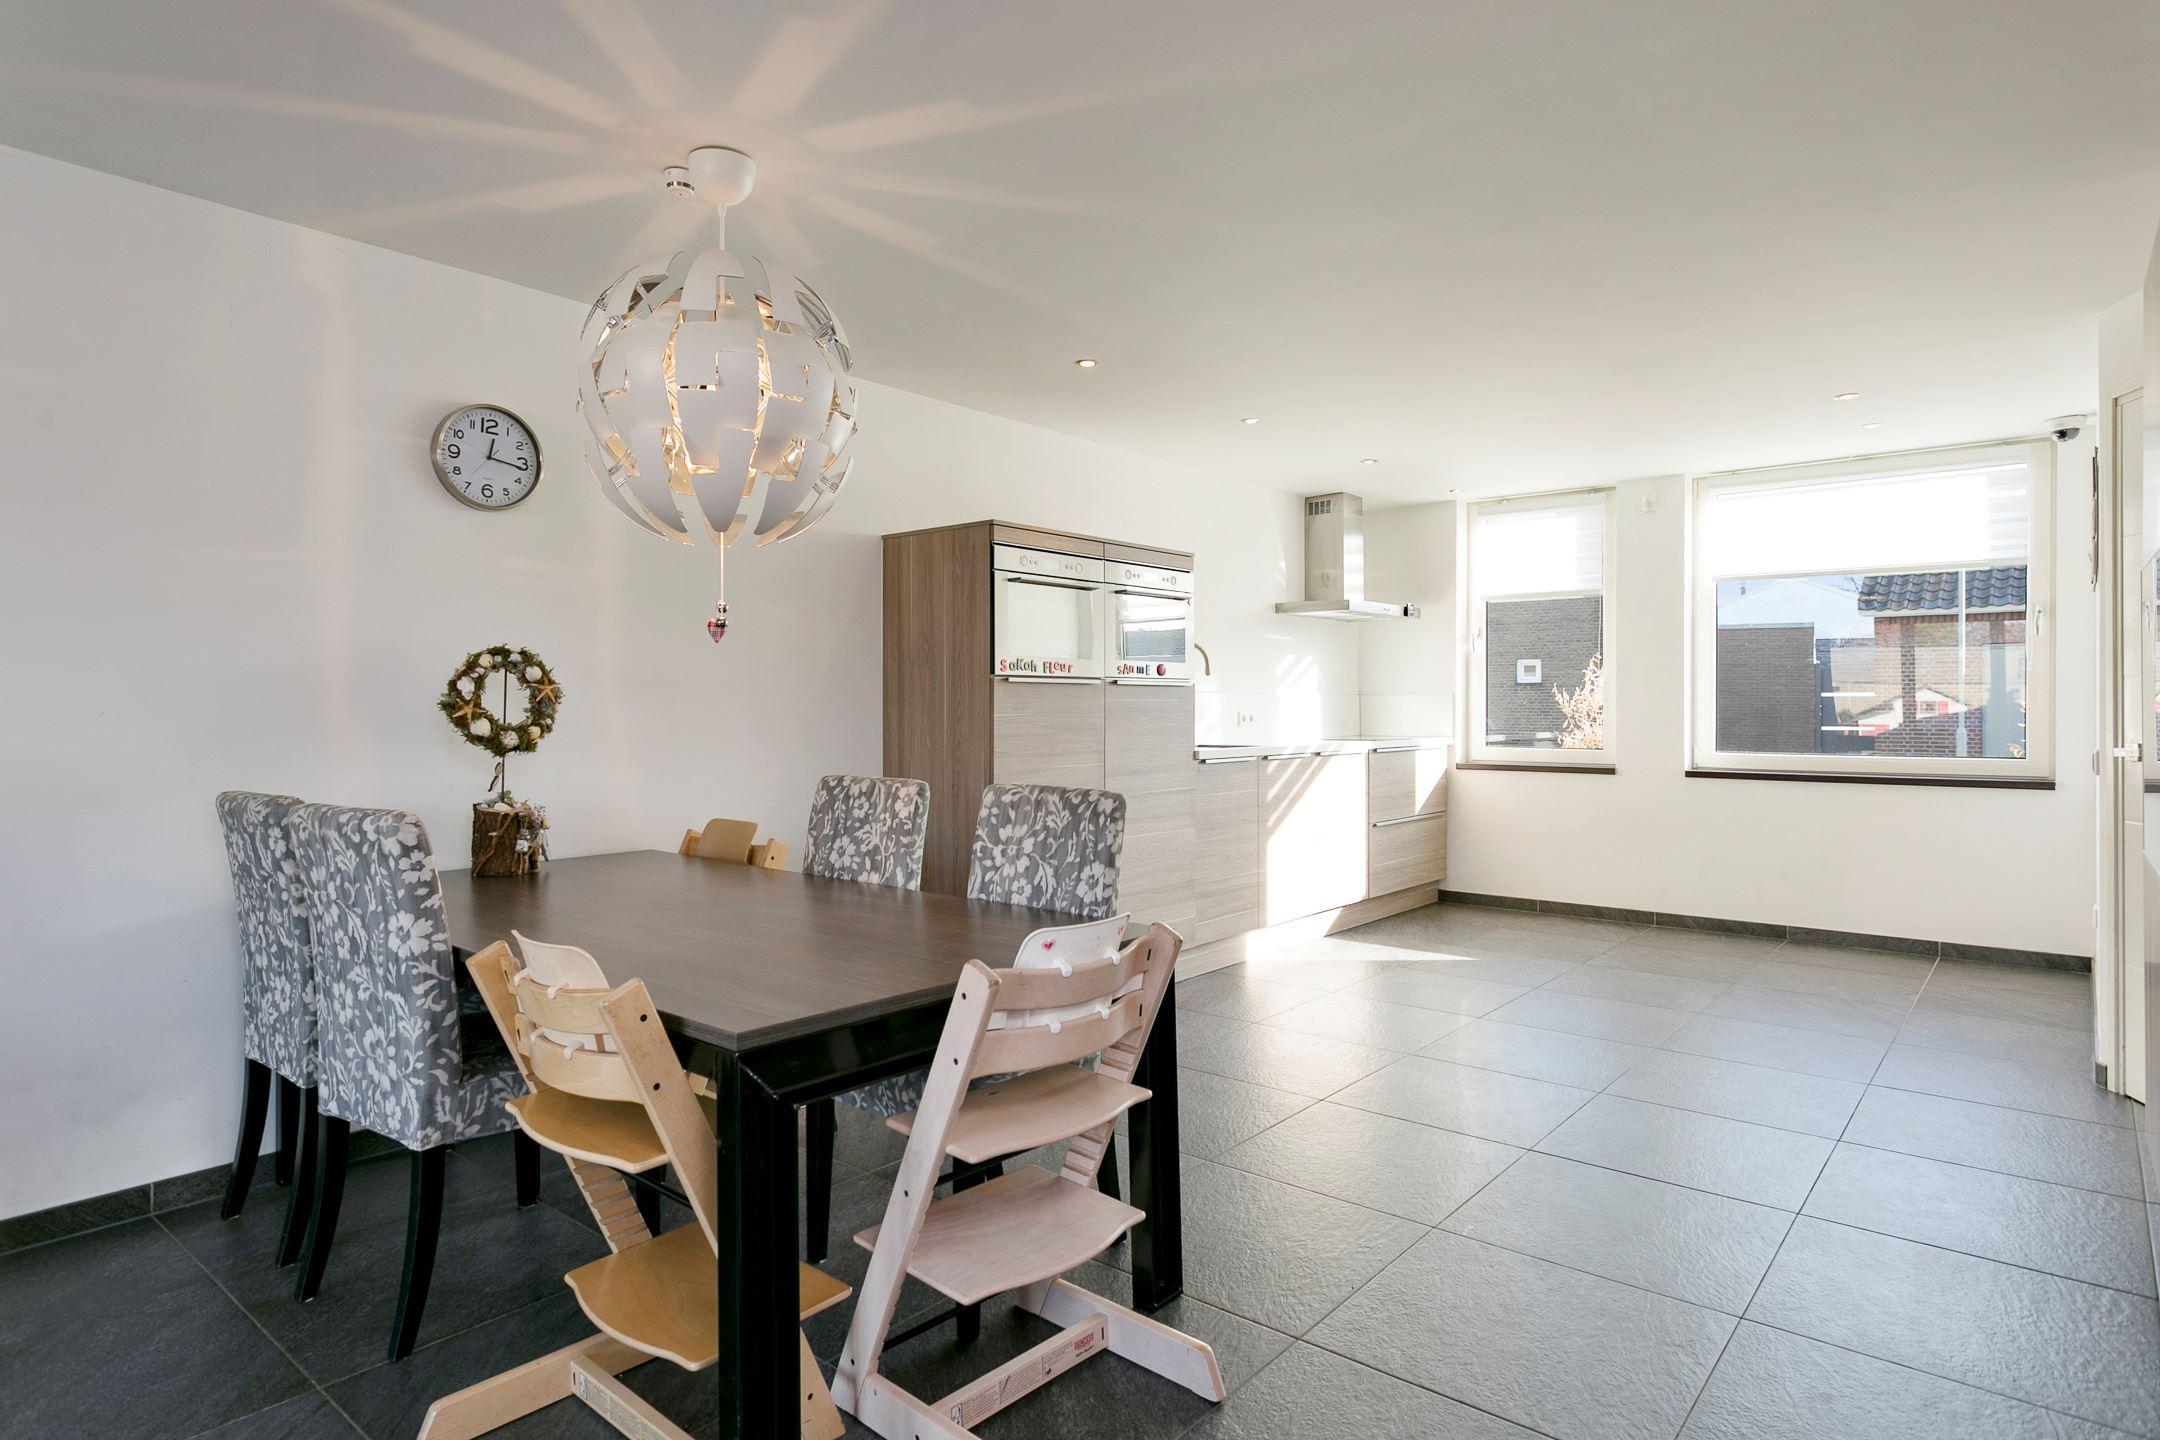 Eetkamer Van Oranje : ≥ a eetkamer stoelen stoel vintage stoelen marktplaats